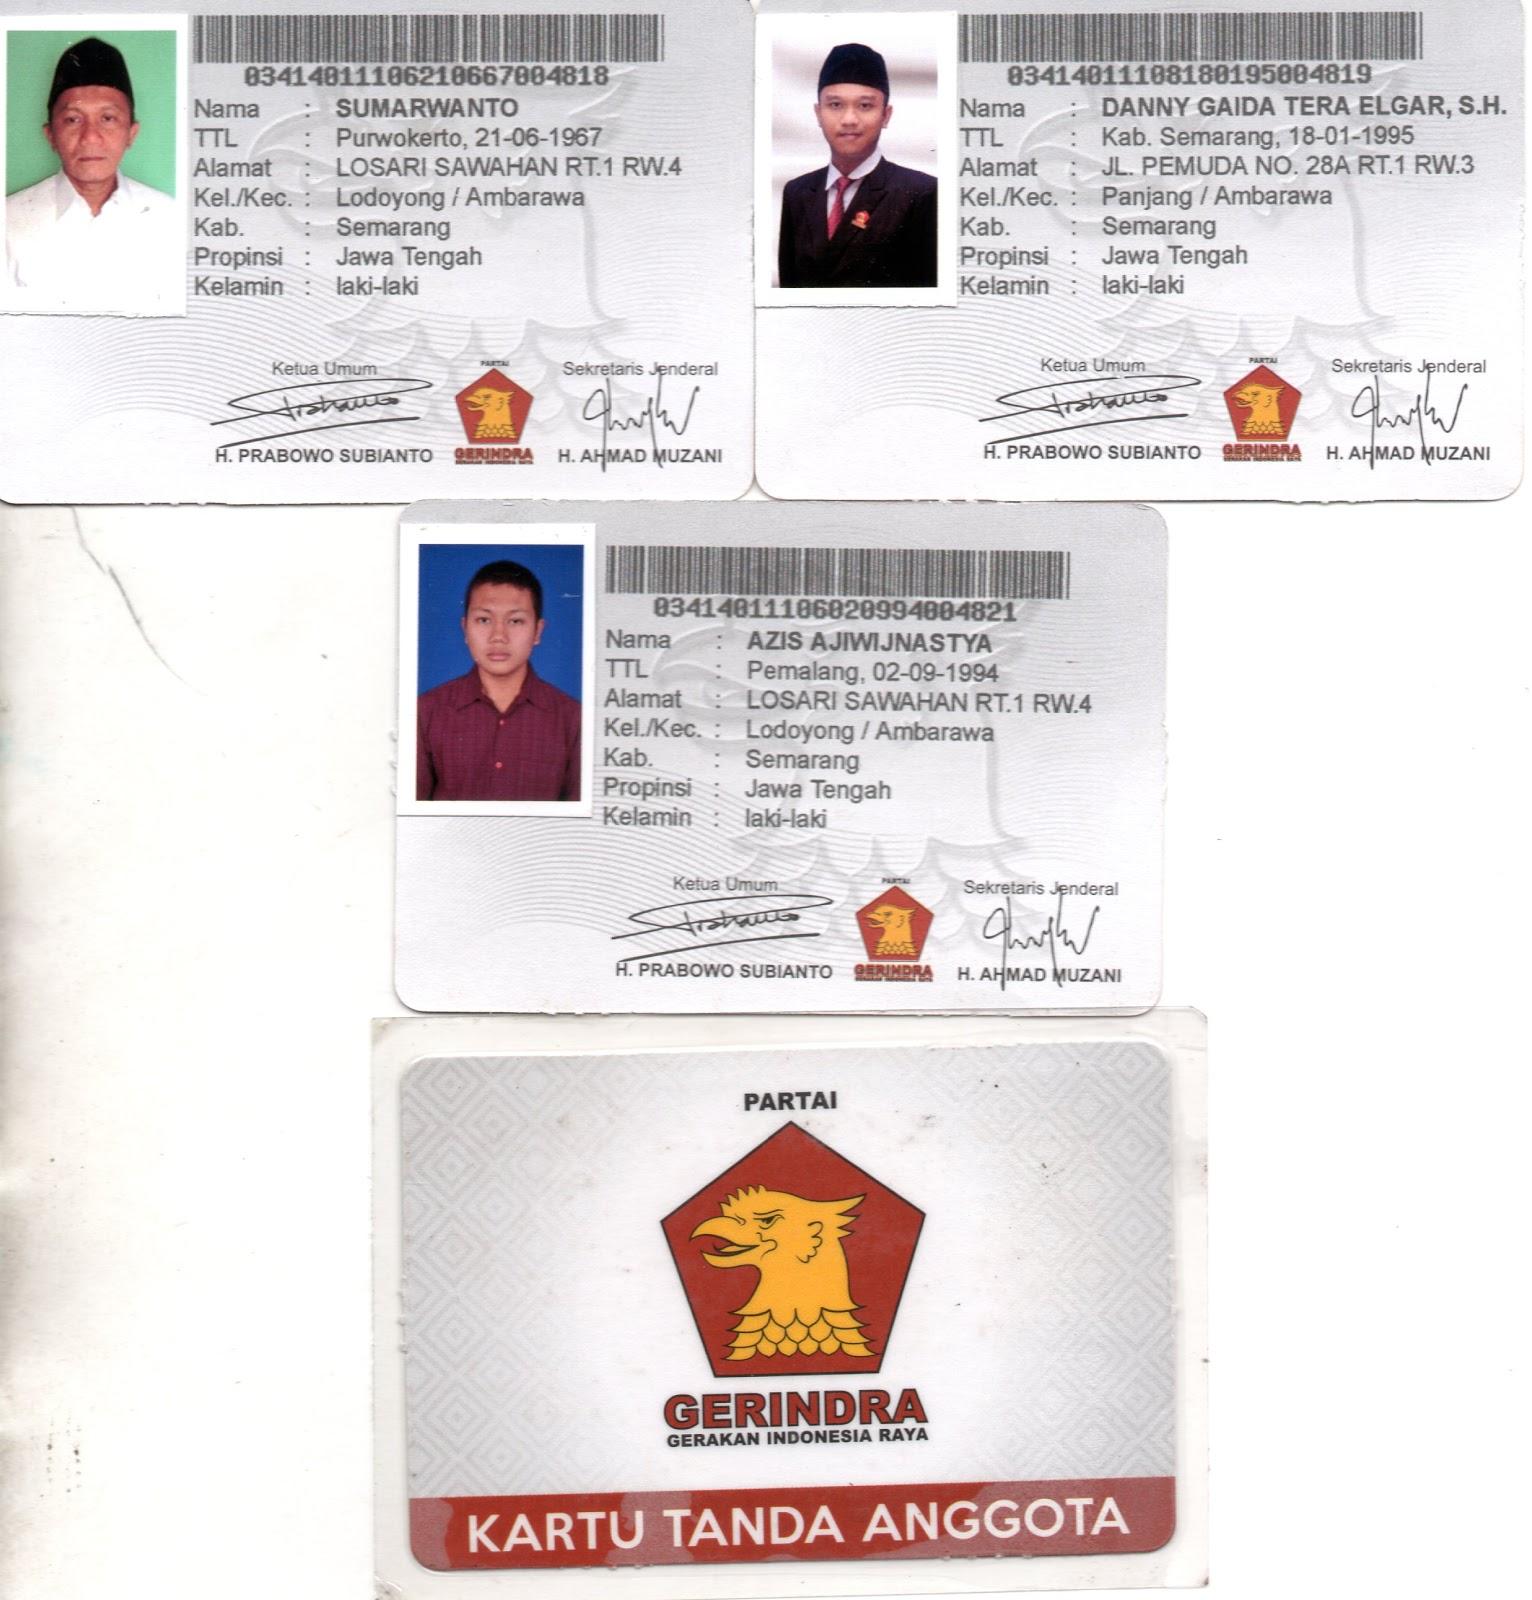 Kartu Tanda Anggota (KTA) Partai Gerakan Indonesia Raya (Gerindra) Pimpinan Anak Cabang (PAC) Kecamatan Ambarawa, Kabupaten Semarang, Jawa Tengah, Indonesia.